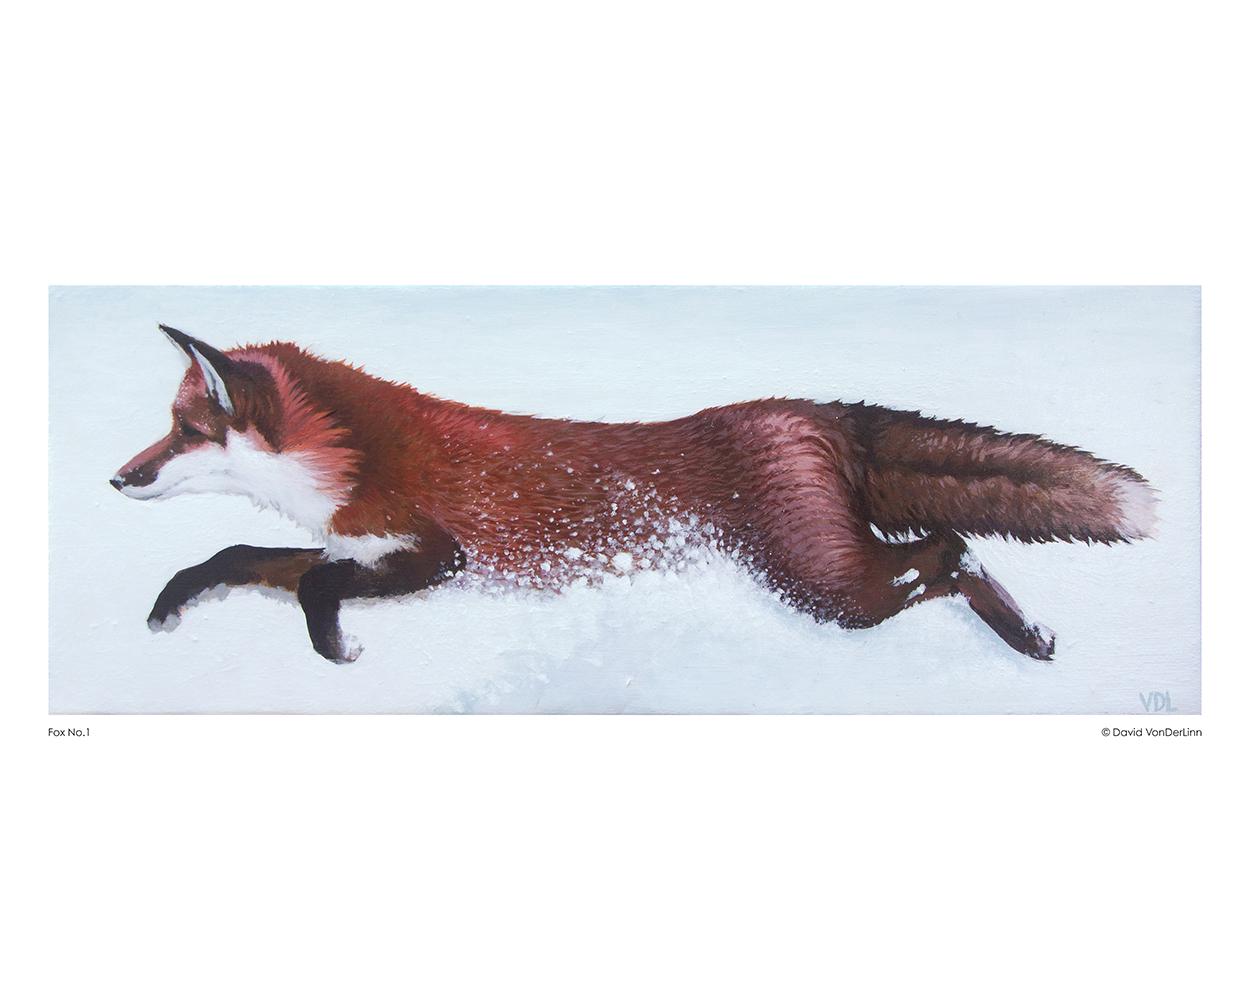 fox_no_01_8x10